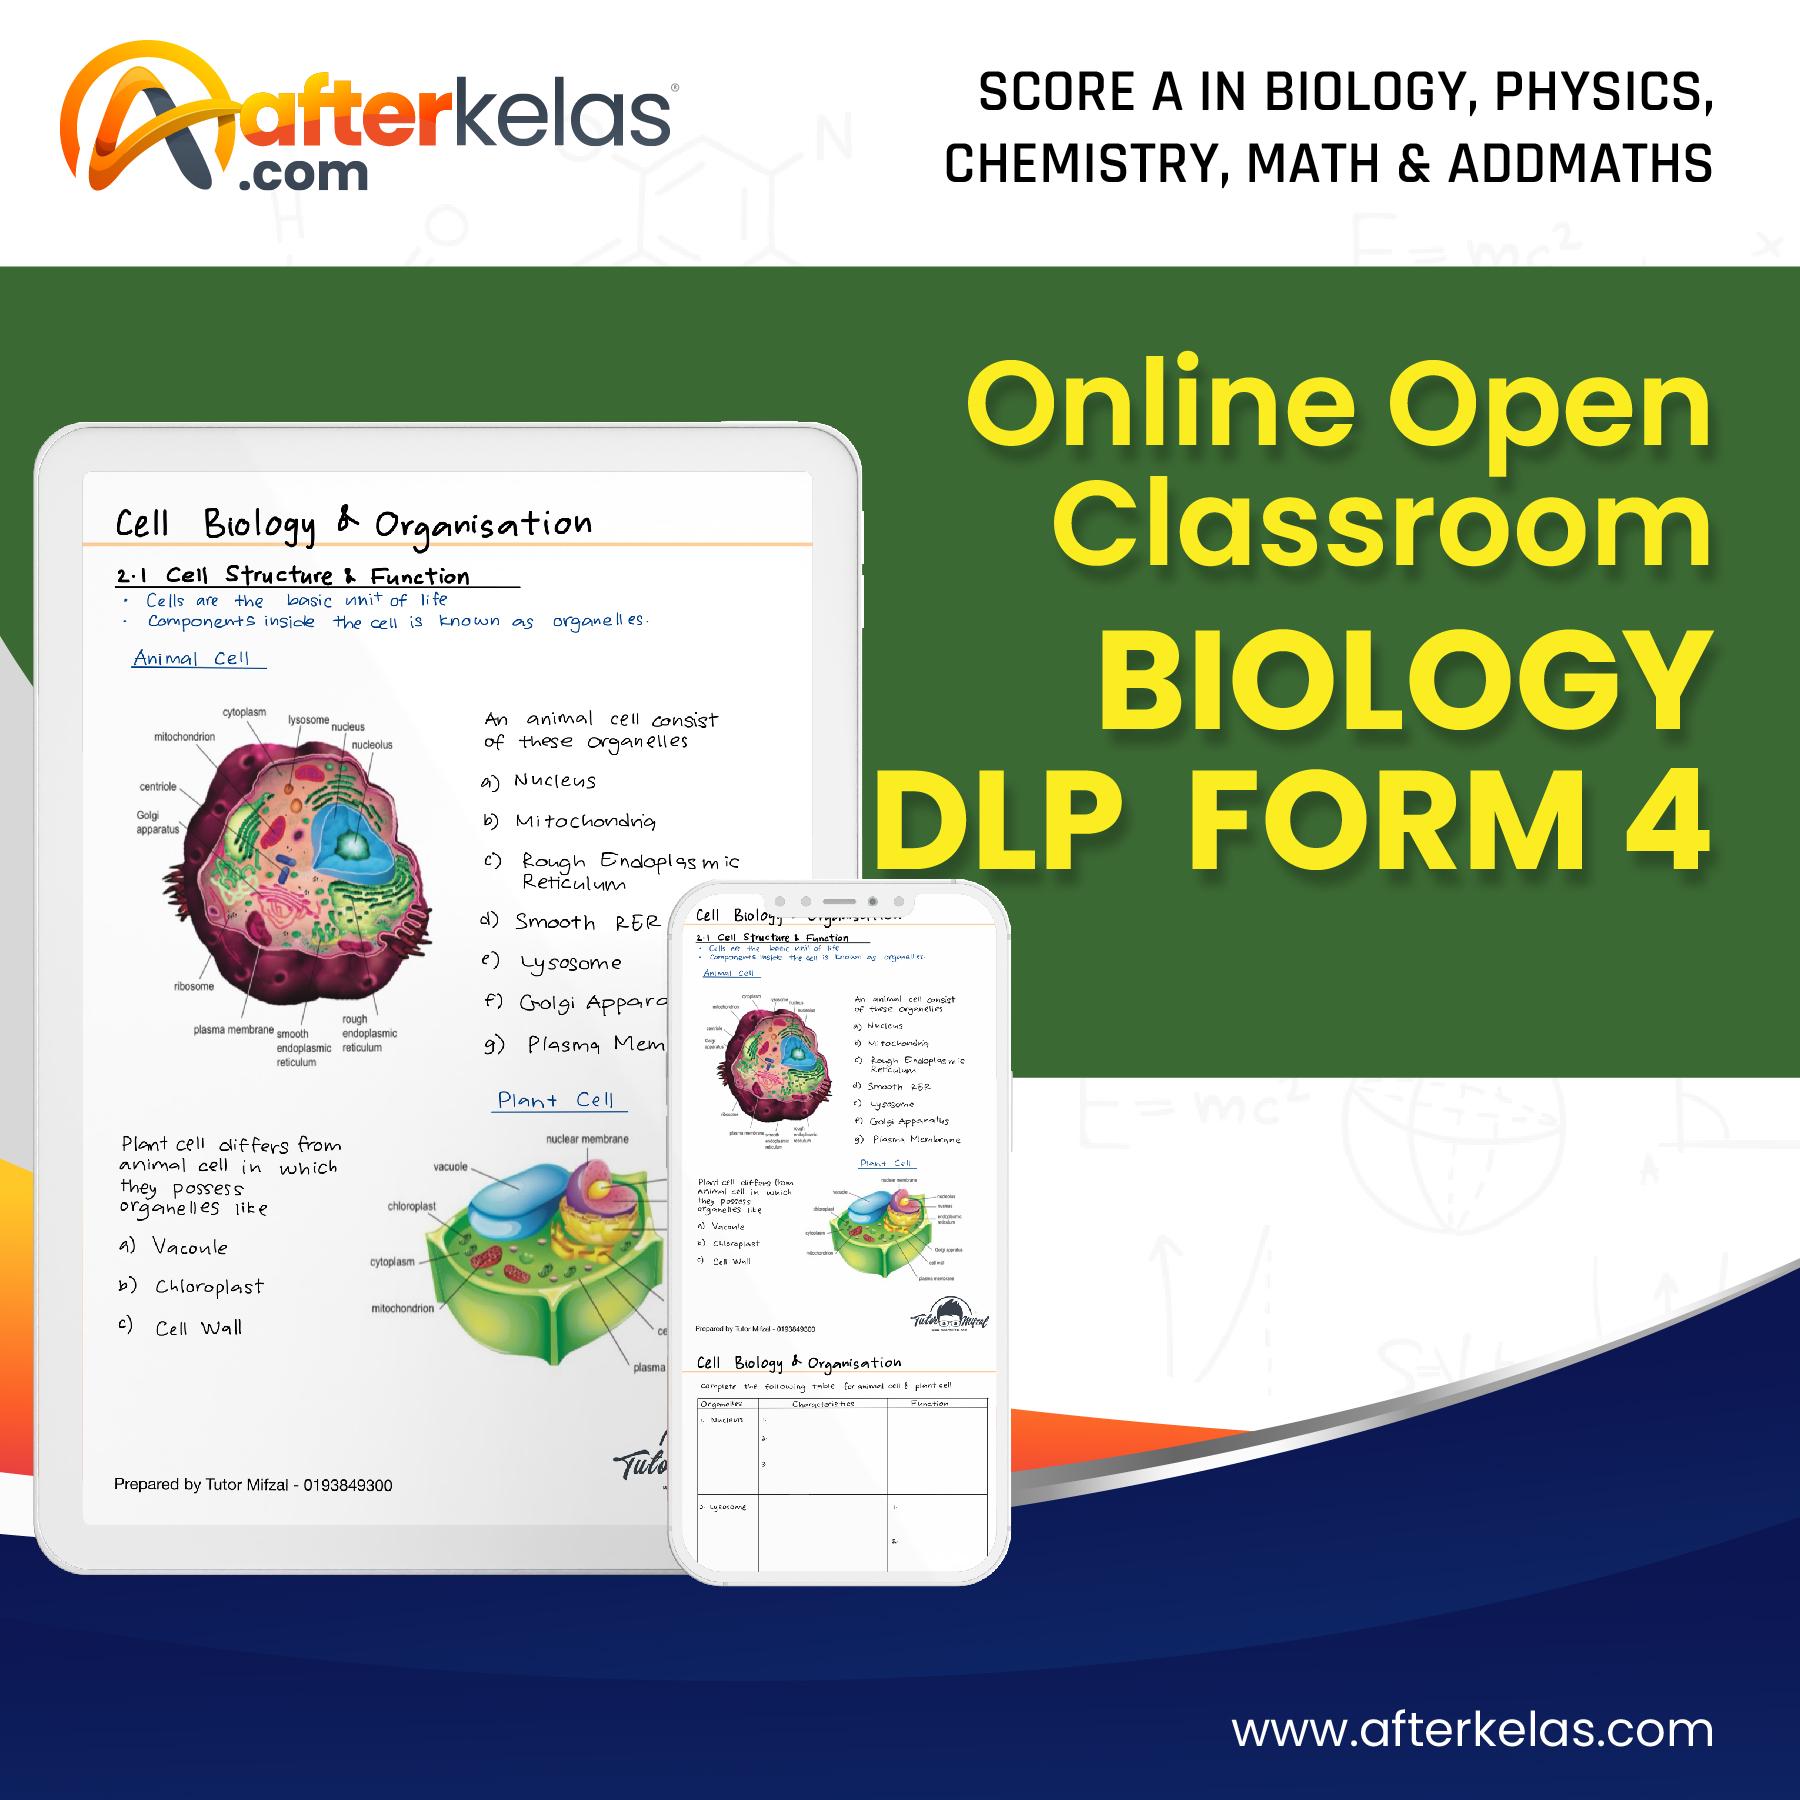 F4 biology dlp